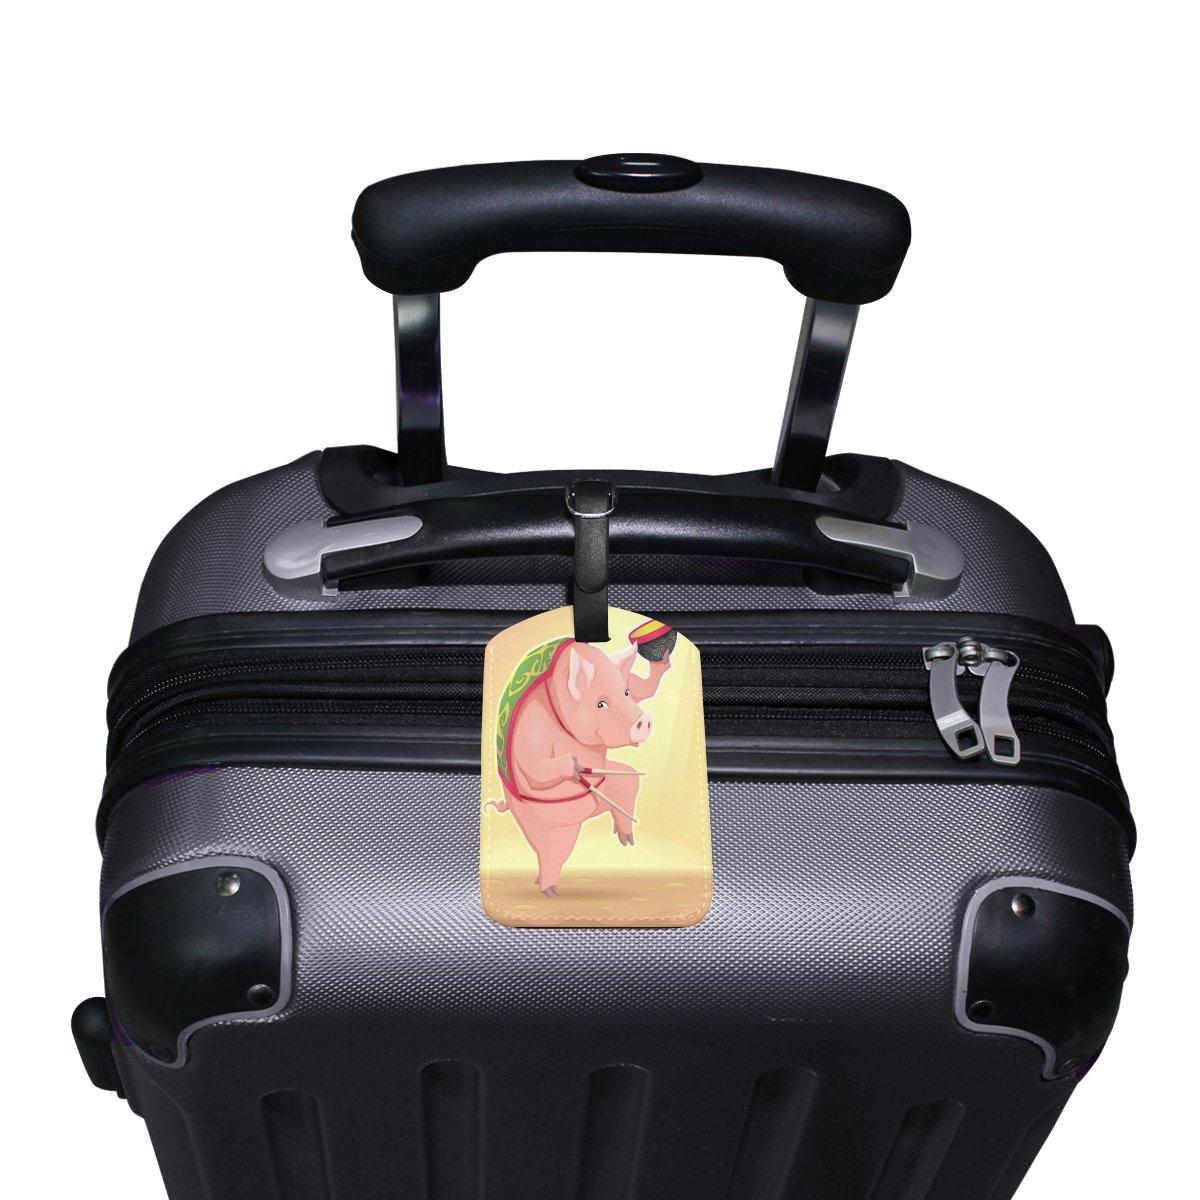 Saobao Travel Luggage Tag Funny Pig PU Leather Baggage Travel ID